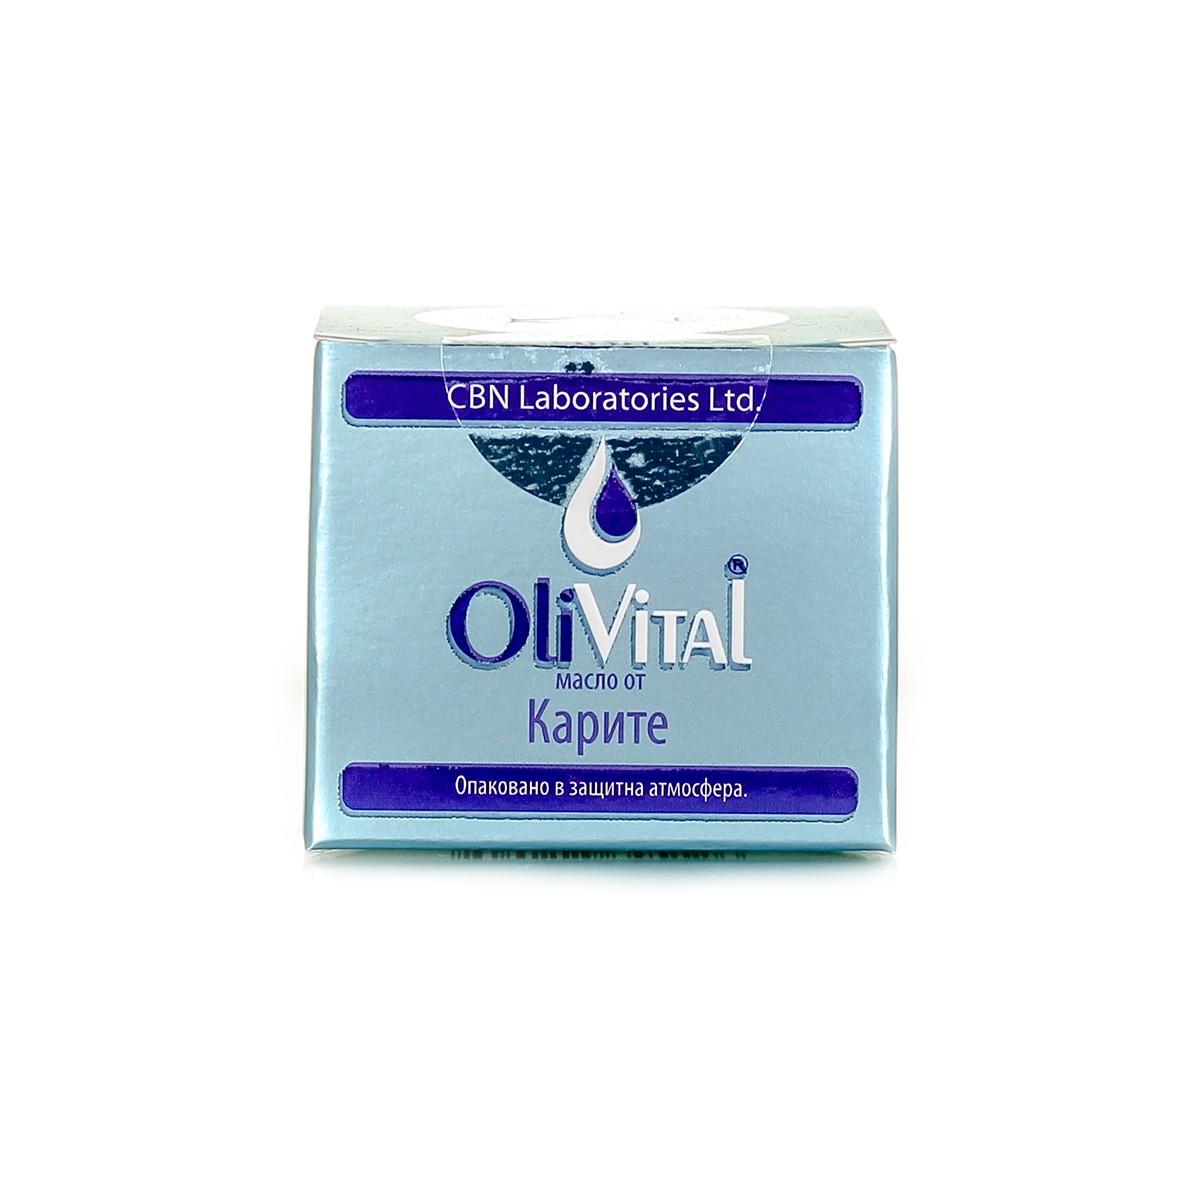 Natural shea butter OliVital CBN Laboratories